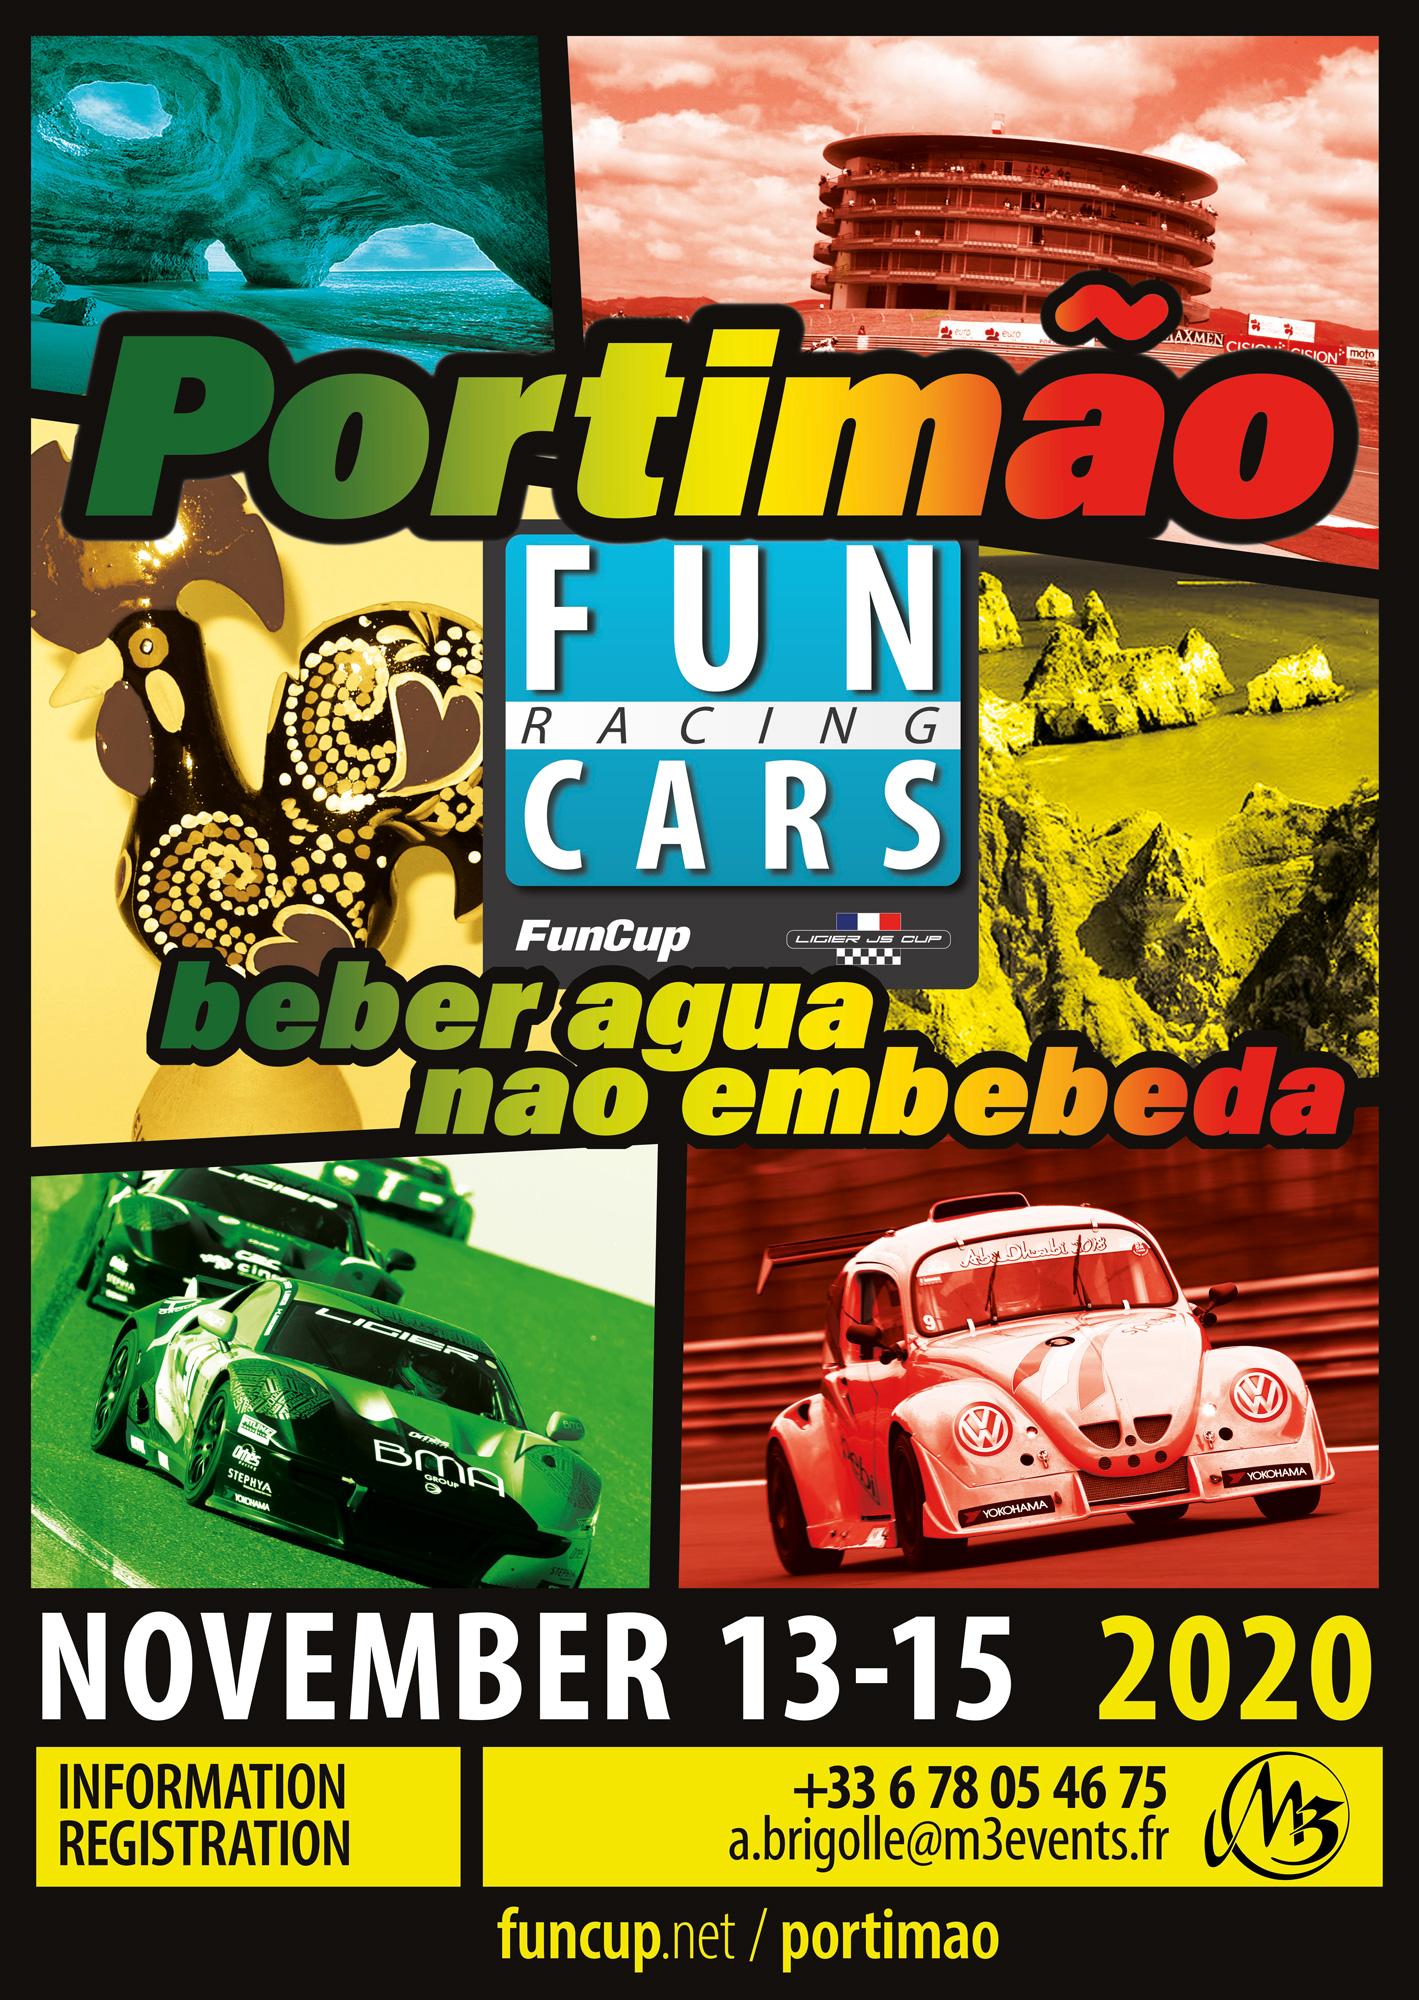 Fun Cup - Portimao - 2020